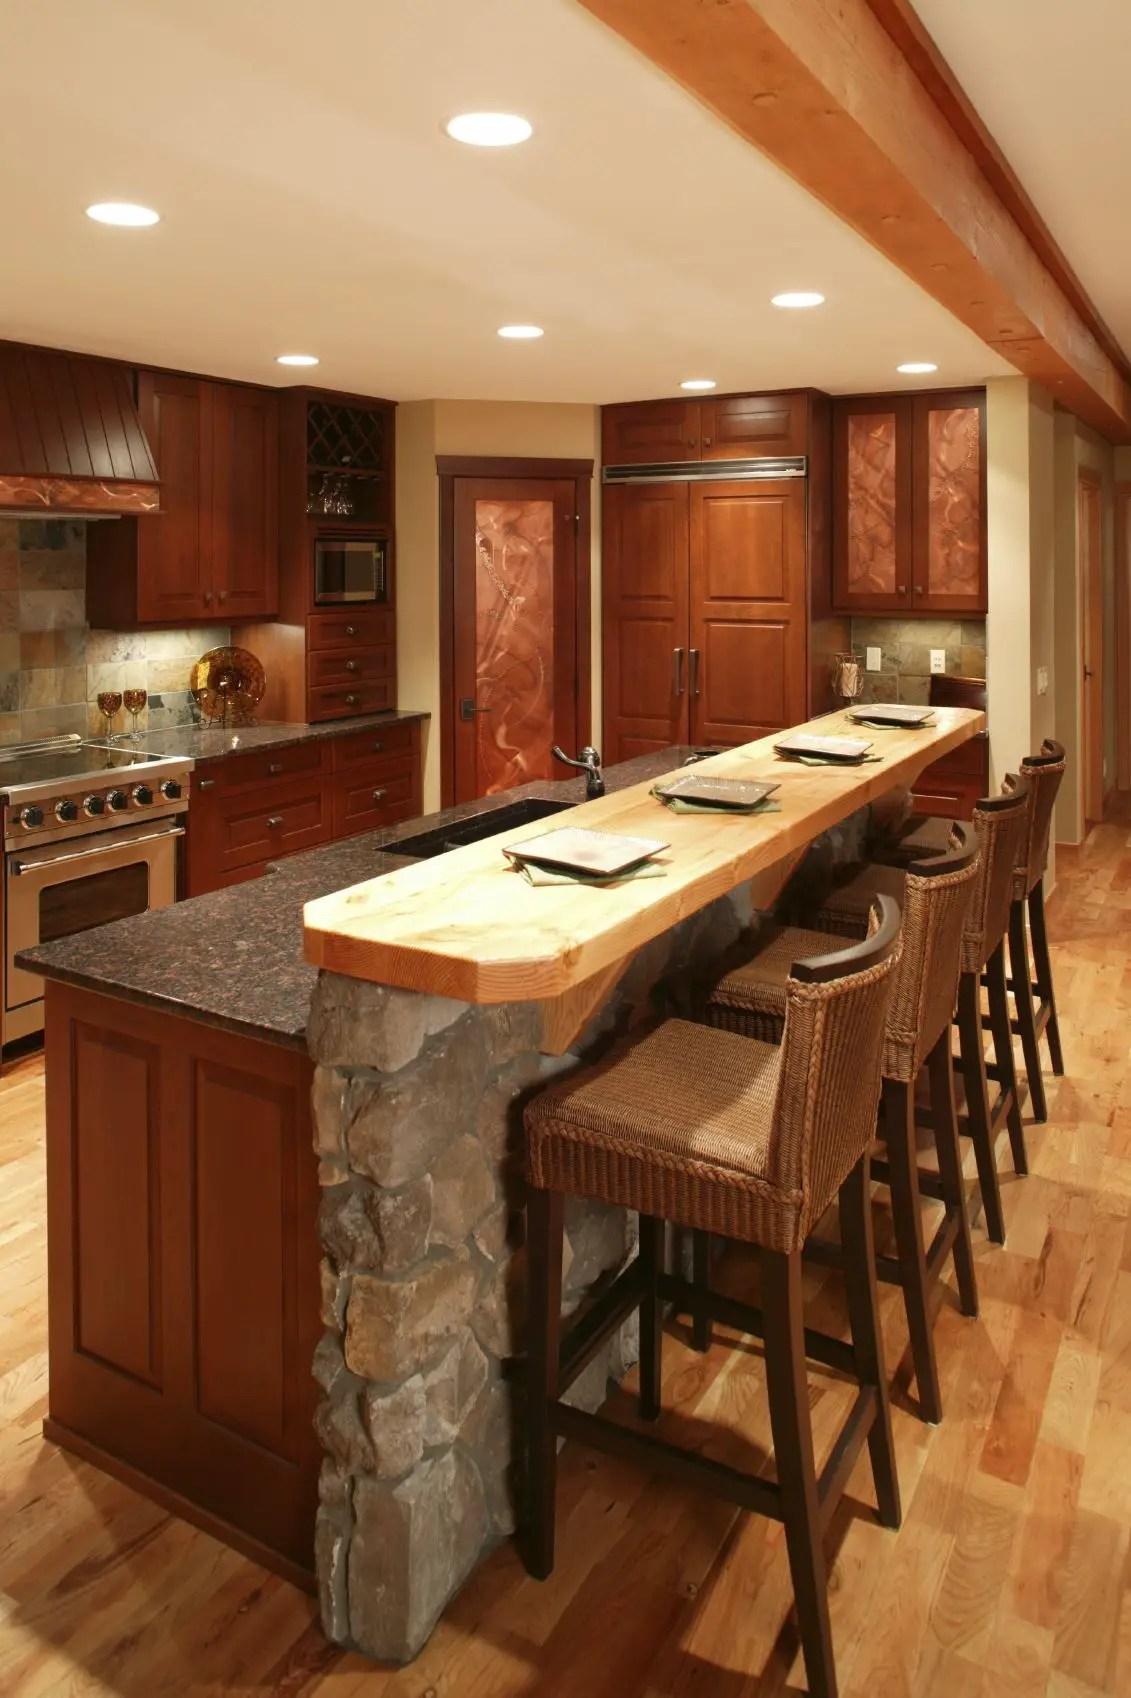 25 Kitchen Island Bars Pictures & Ideas   decoratoo